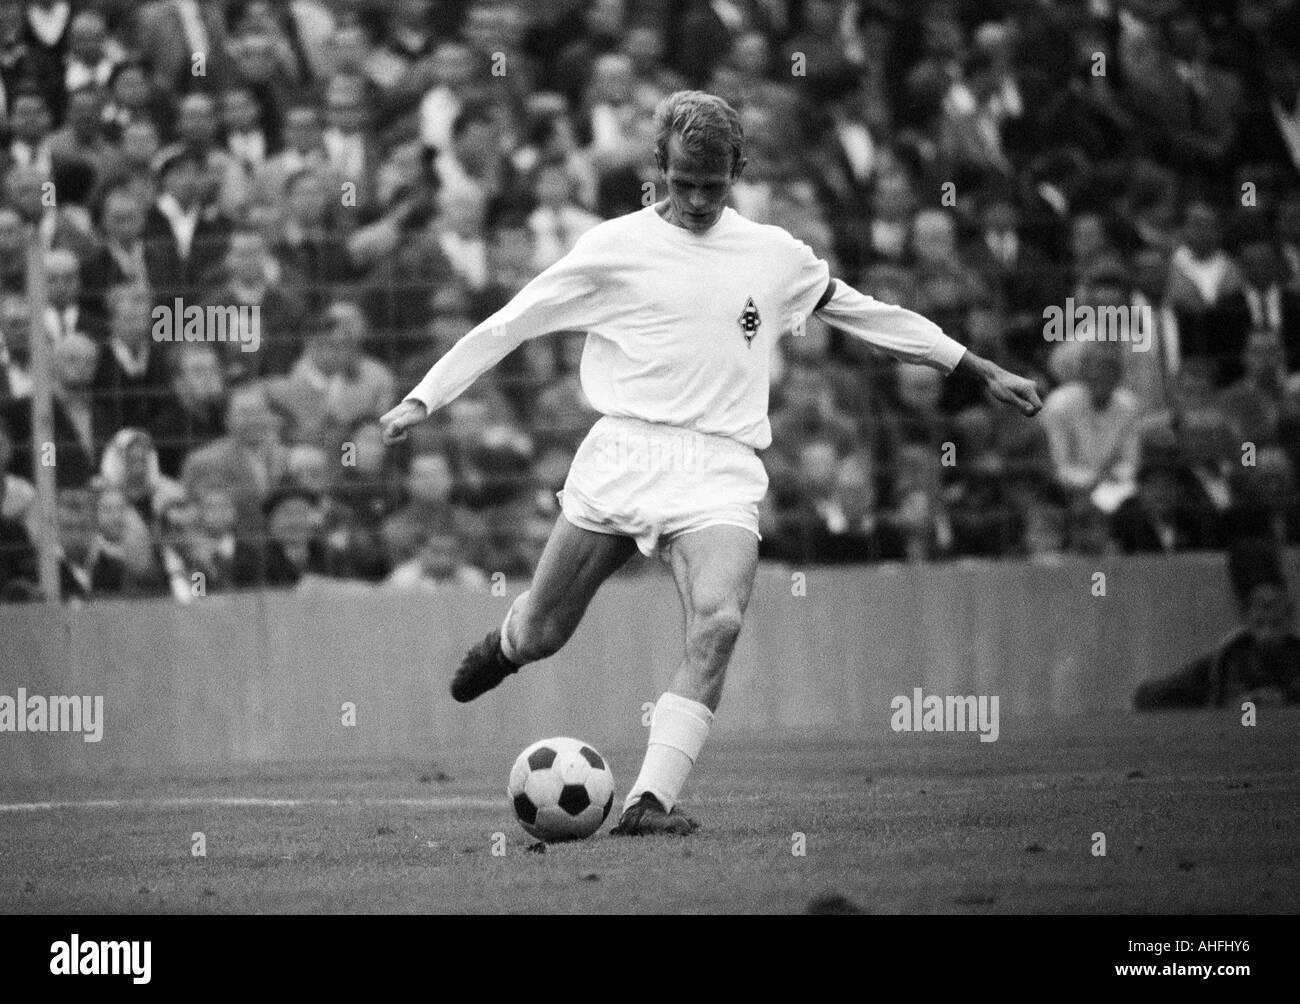 football, Bundesliga, 1966/1967, Stadium at the Gruenwalder Street, FC Bayern Munich versus Borussia Moenchengladbach 4:3, scene of the match, Rudolf Poeggeler (MG) in ball possession - Stock Image